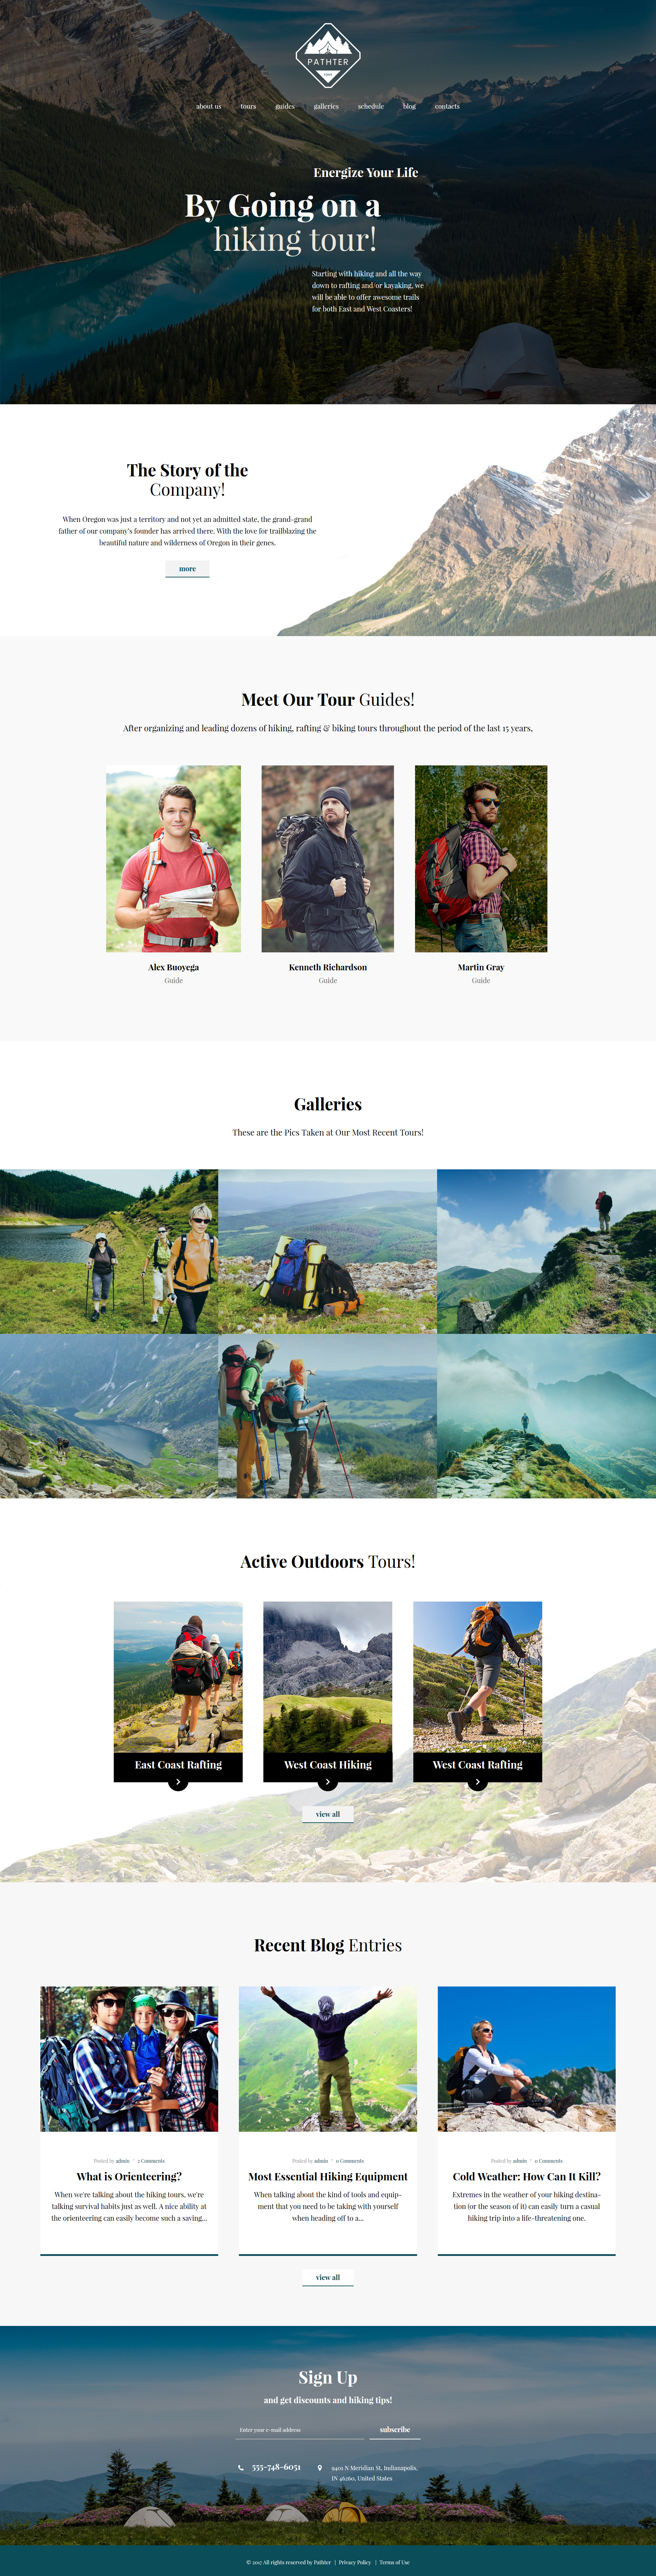 """Hiking & Camping Tours"" 响应式WordPress模板 #62388 - 截图"